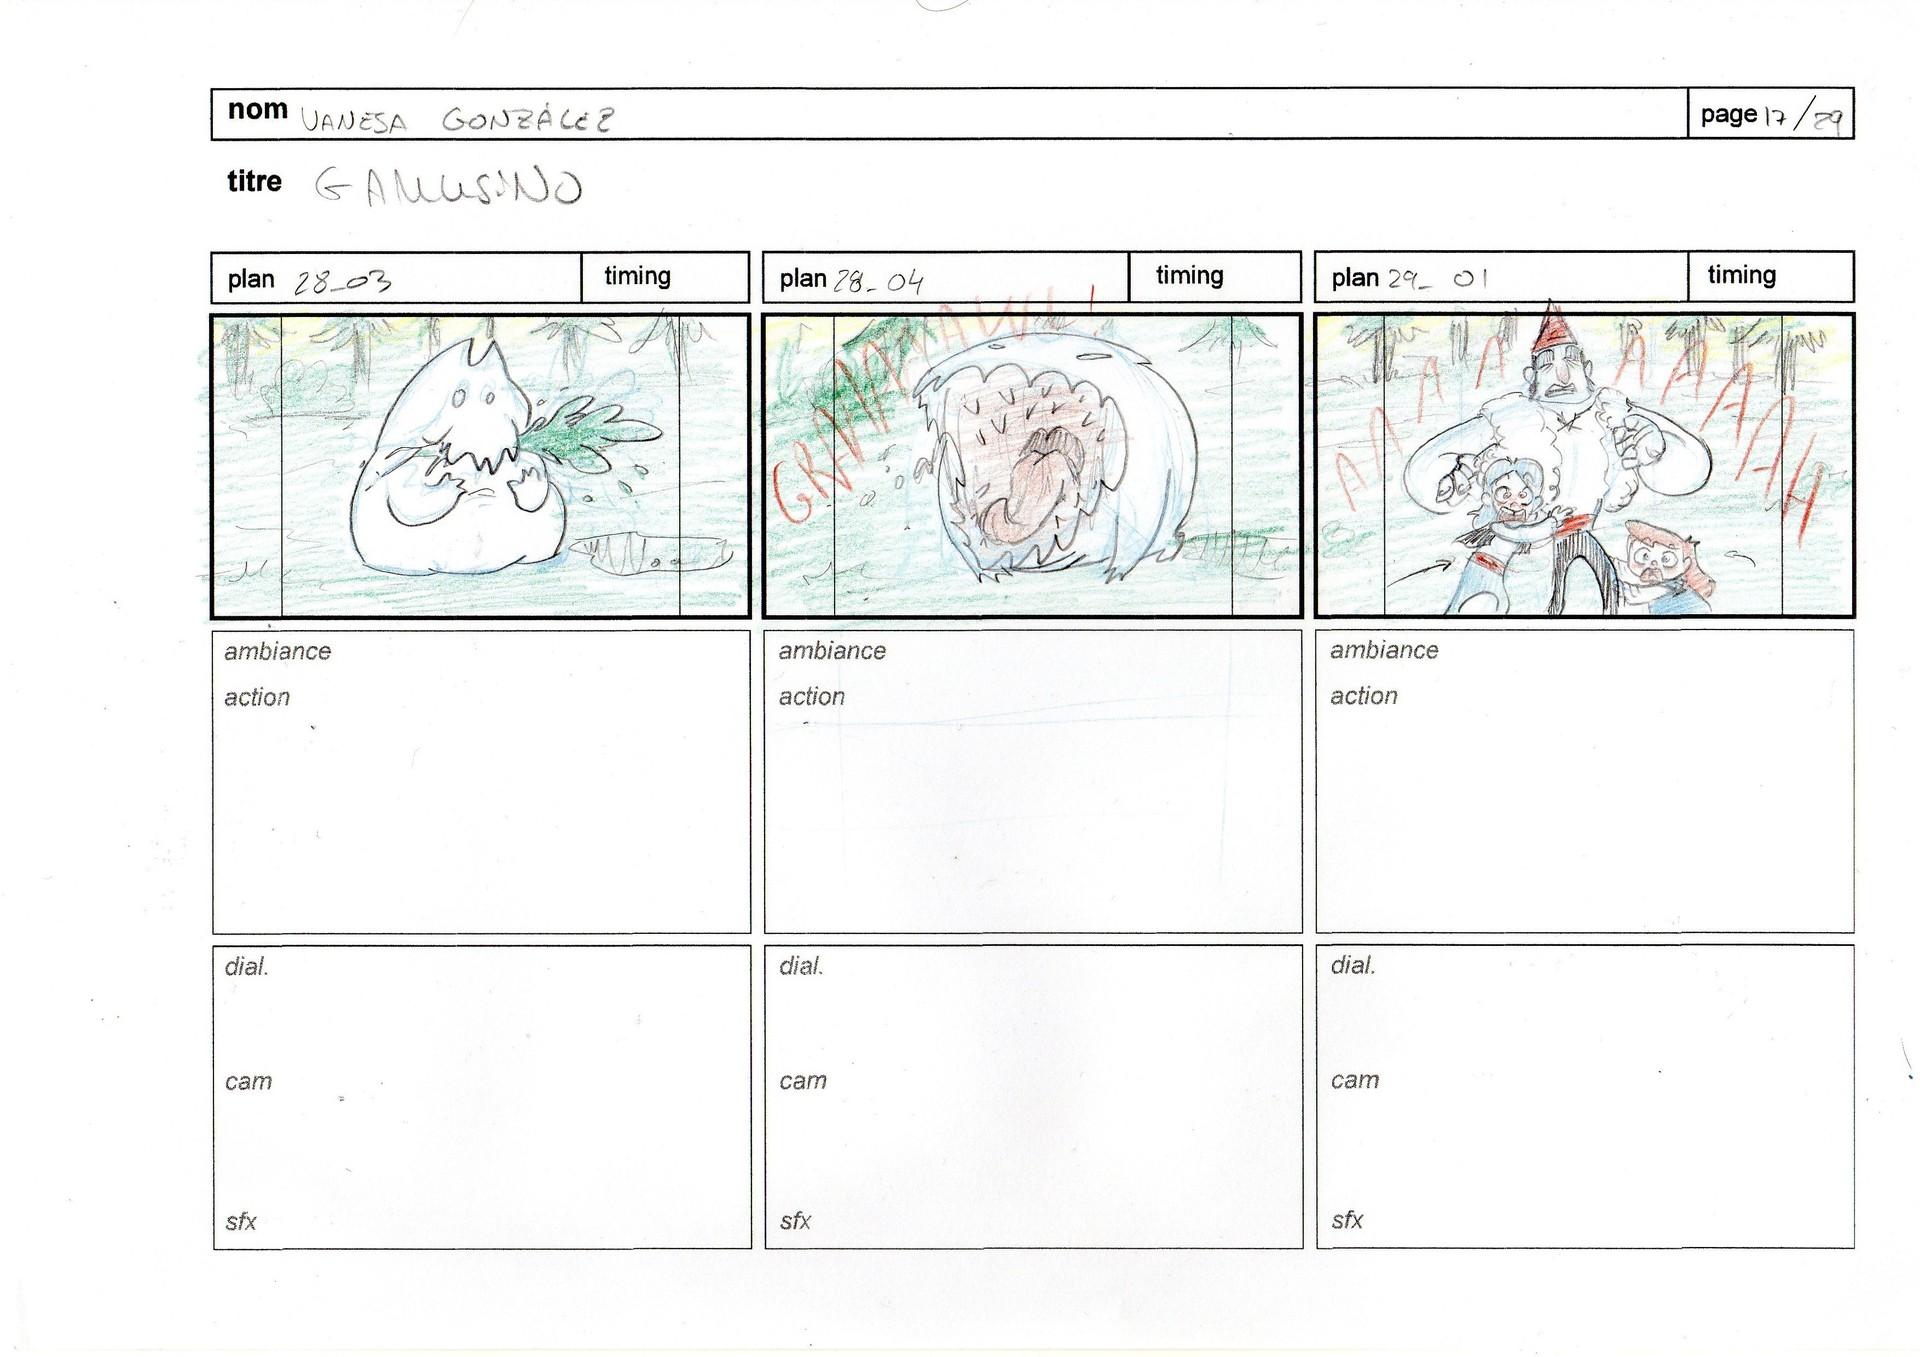 Vanesa gonzalez storyboard gamusino pages 17